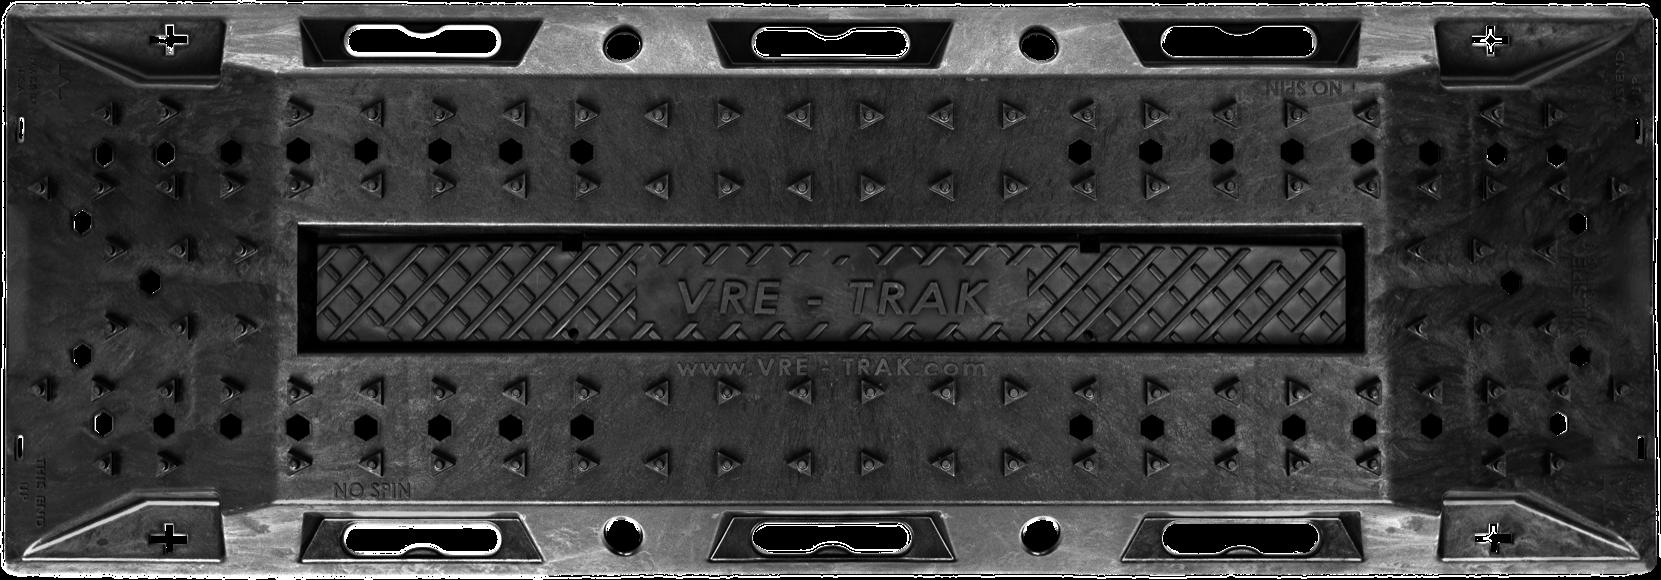 VRE TRAK Top View Black